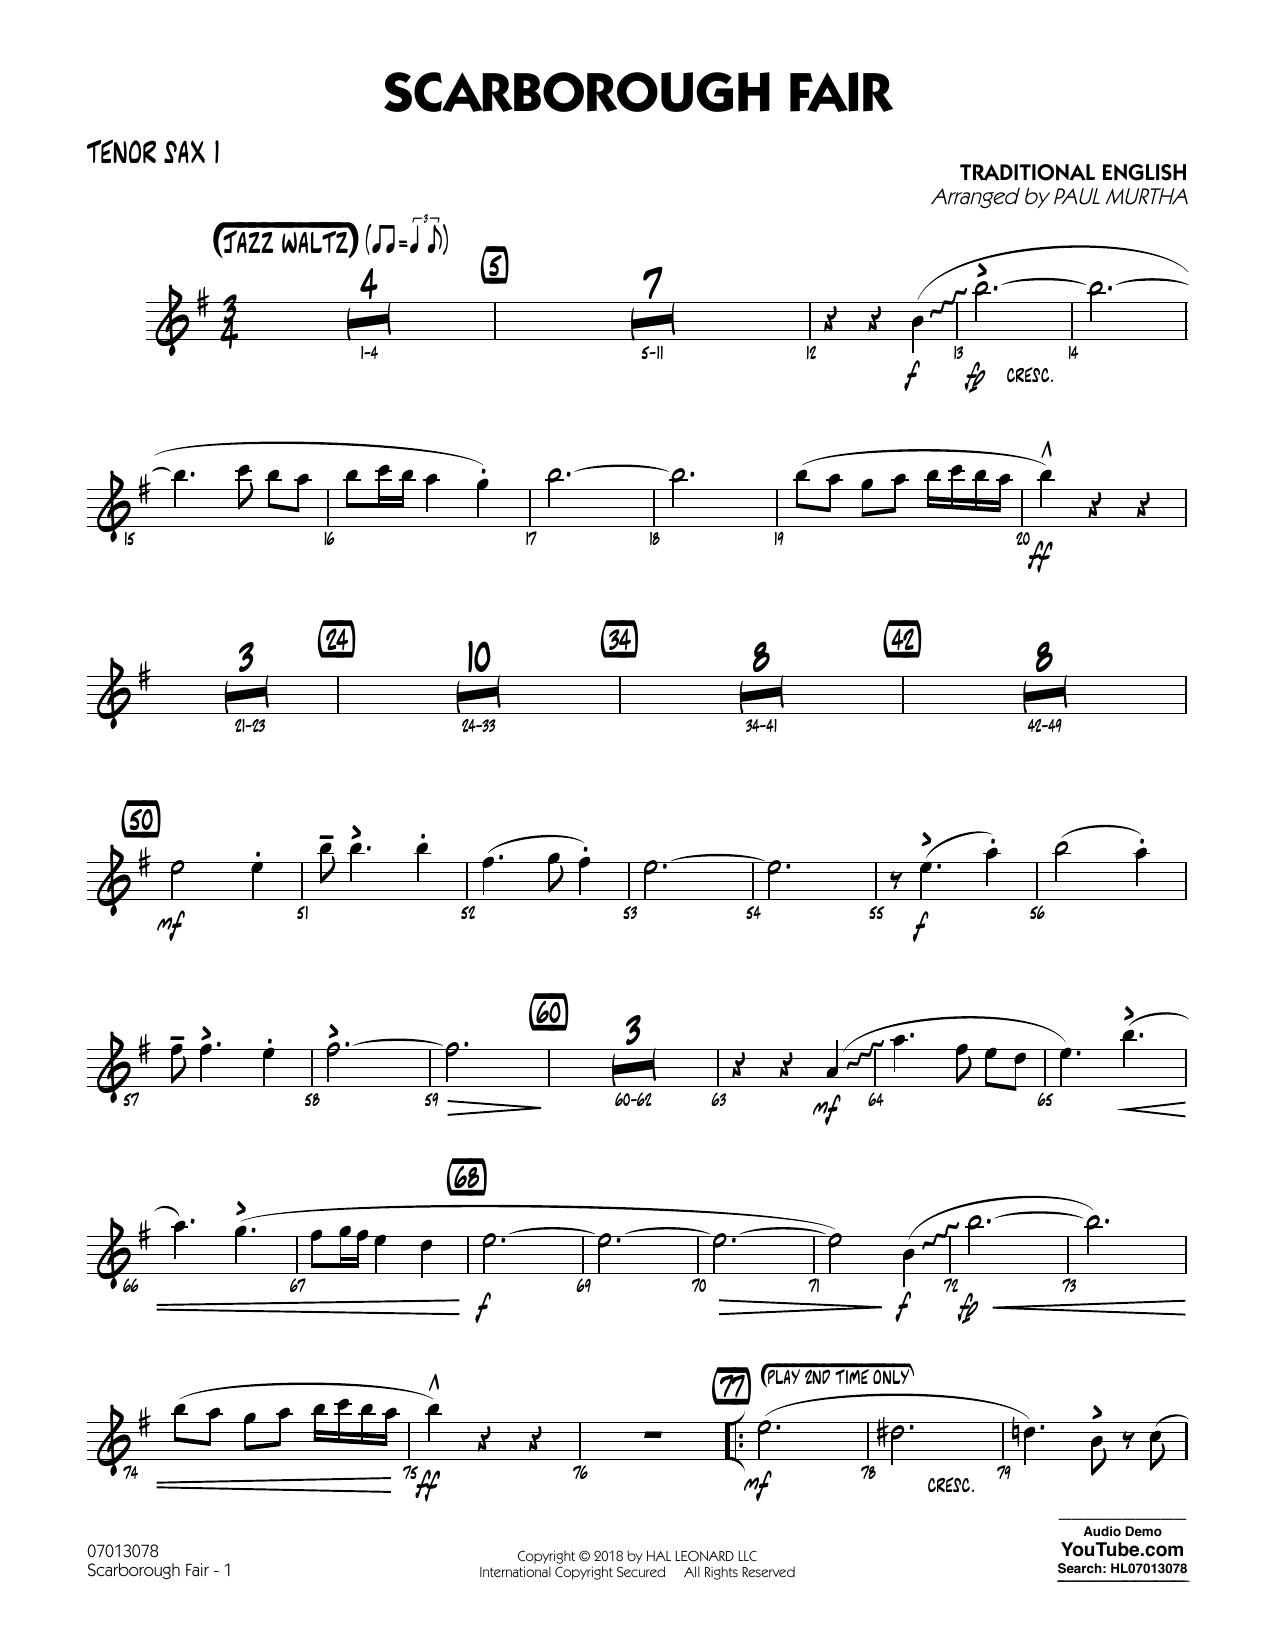 Paul Murtha Scarborough Fair - Tenor Sax 1 sheet music notes and chords. Download Printable PDF.